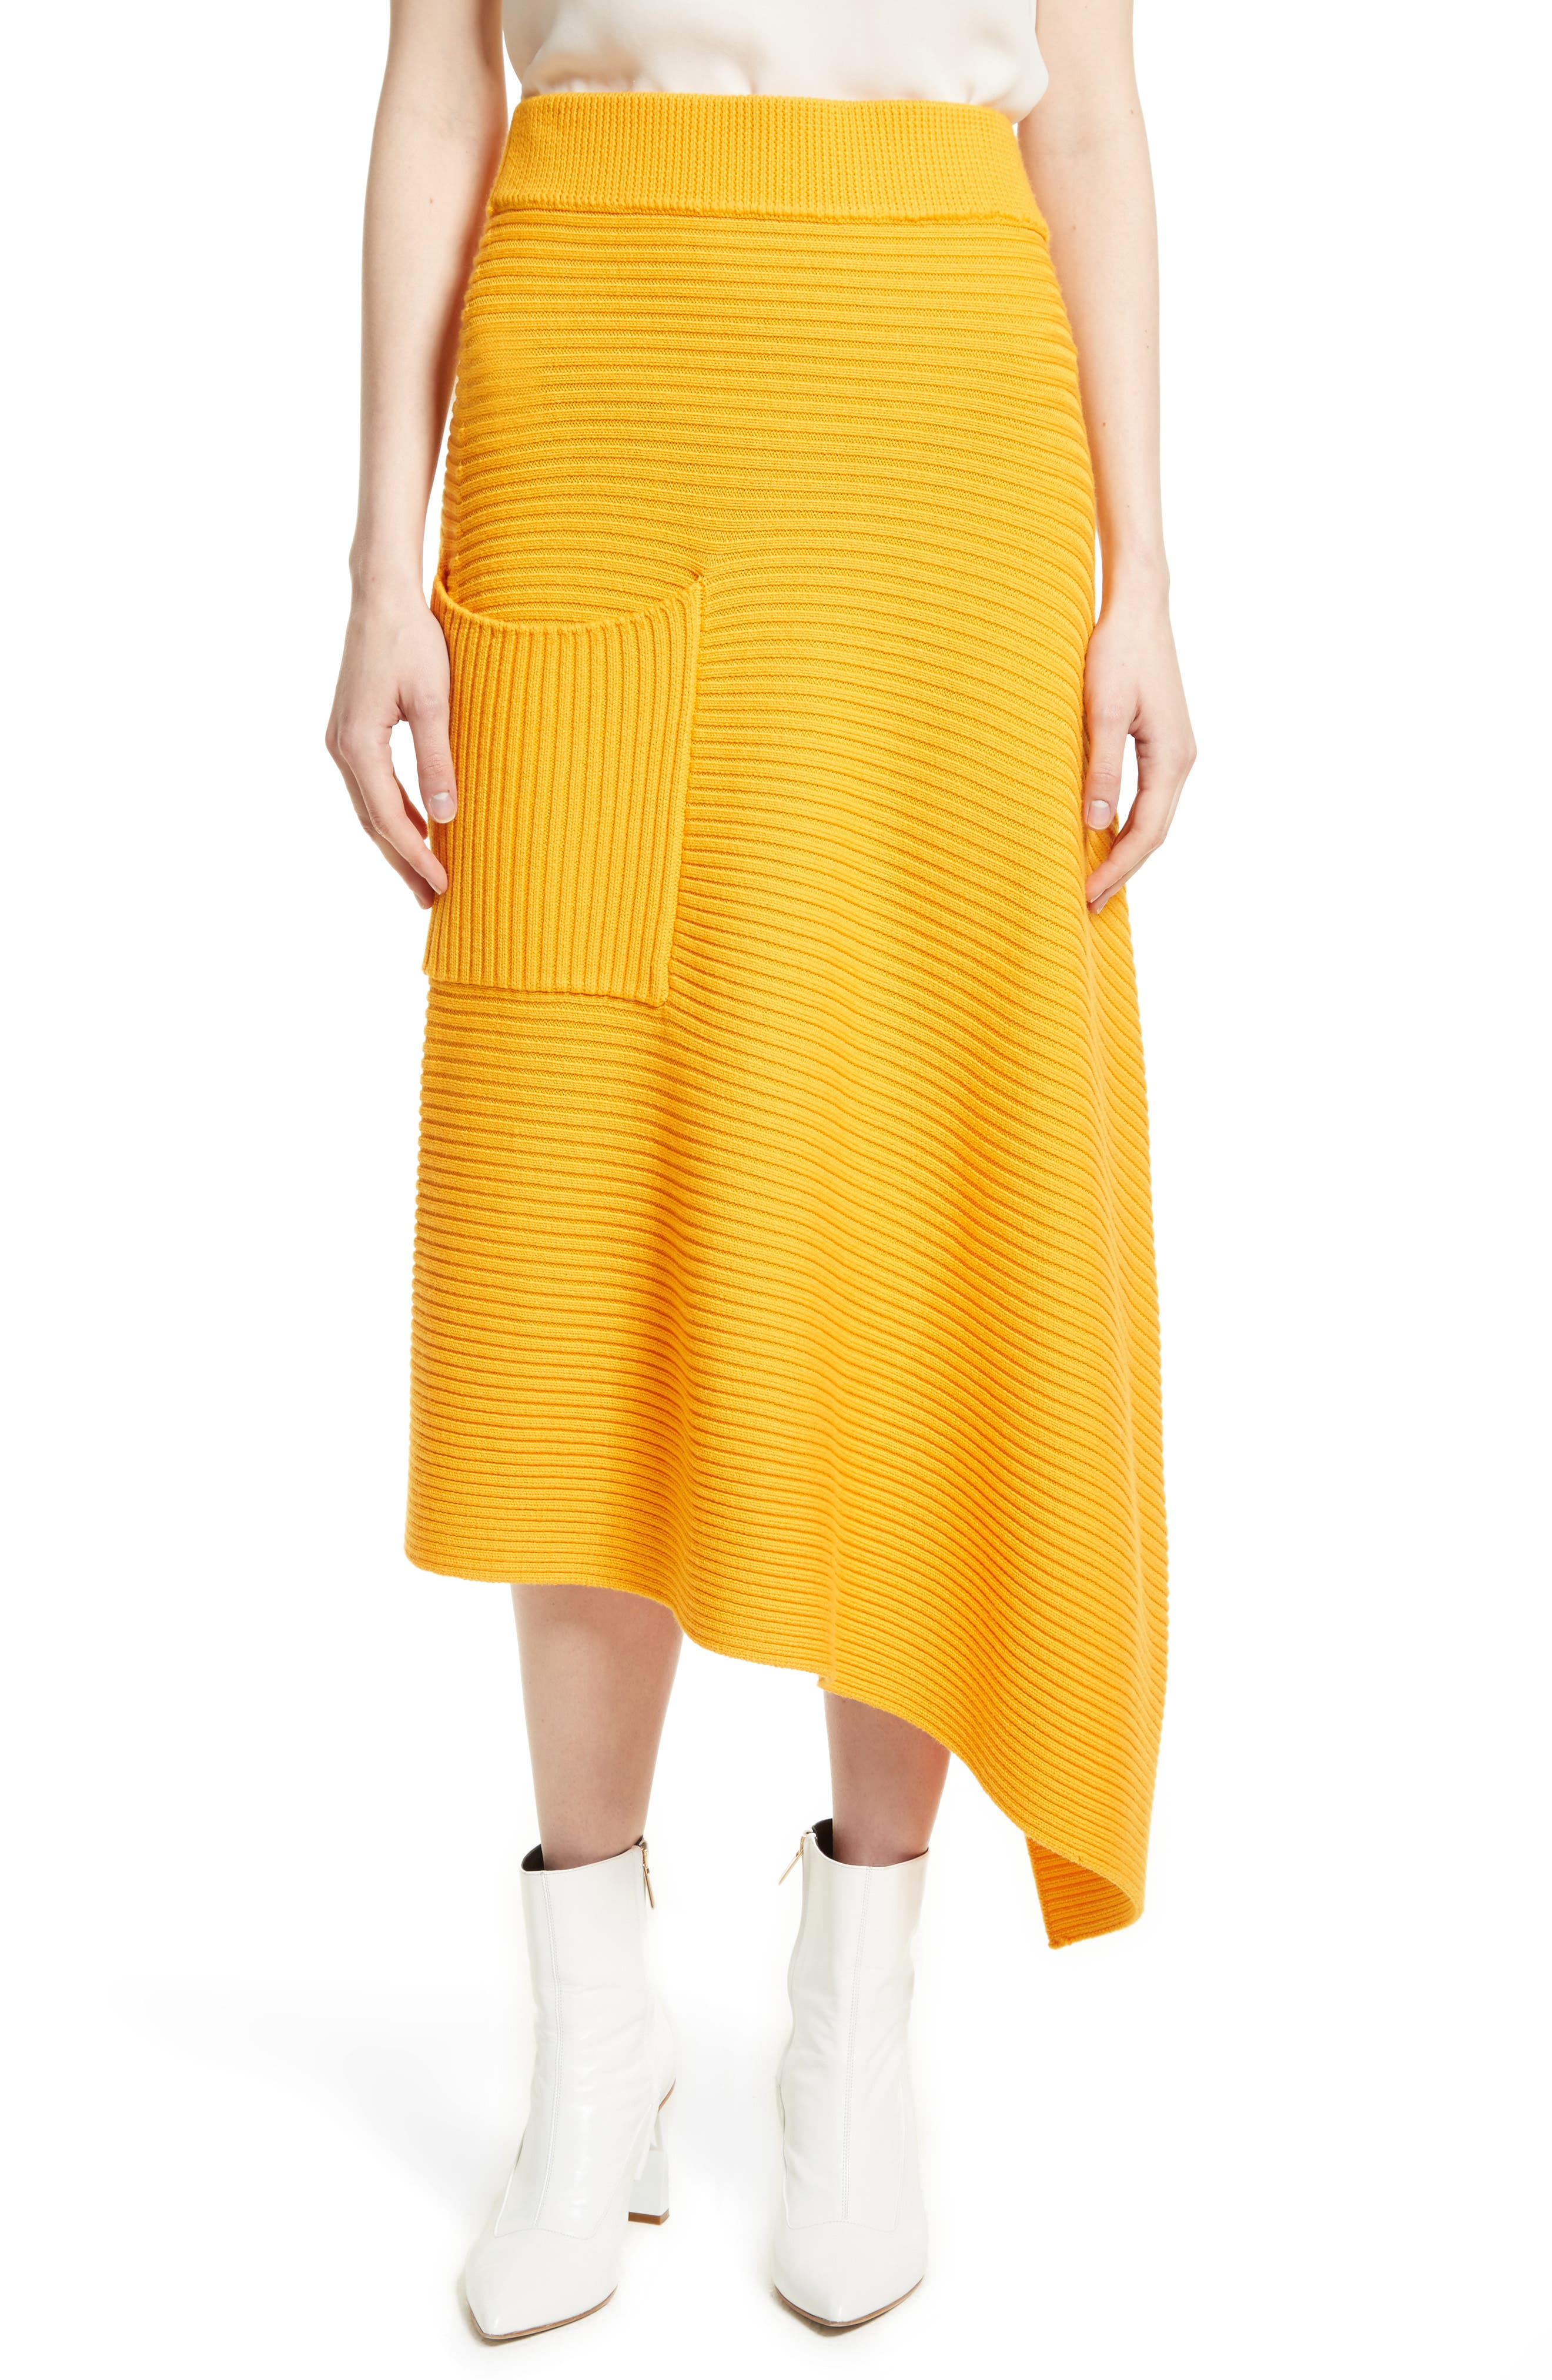 Alternate Image 1 Selected - Tibi Asymmetrical Rib Merino Wool Skirt